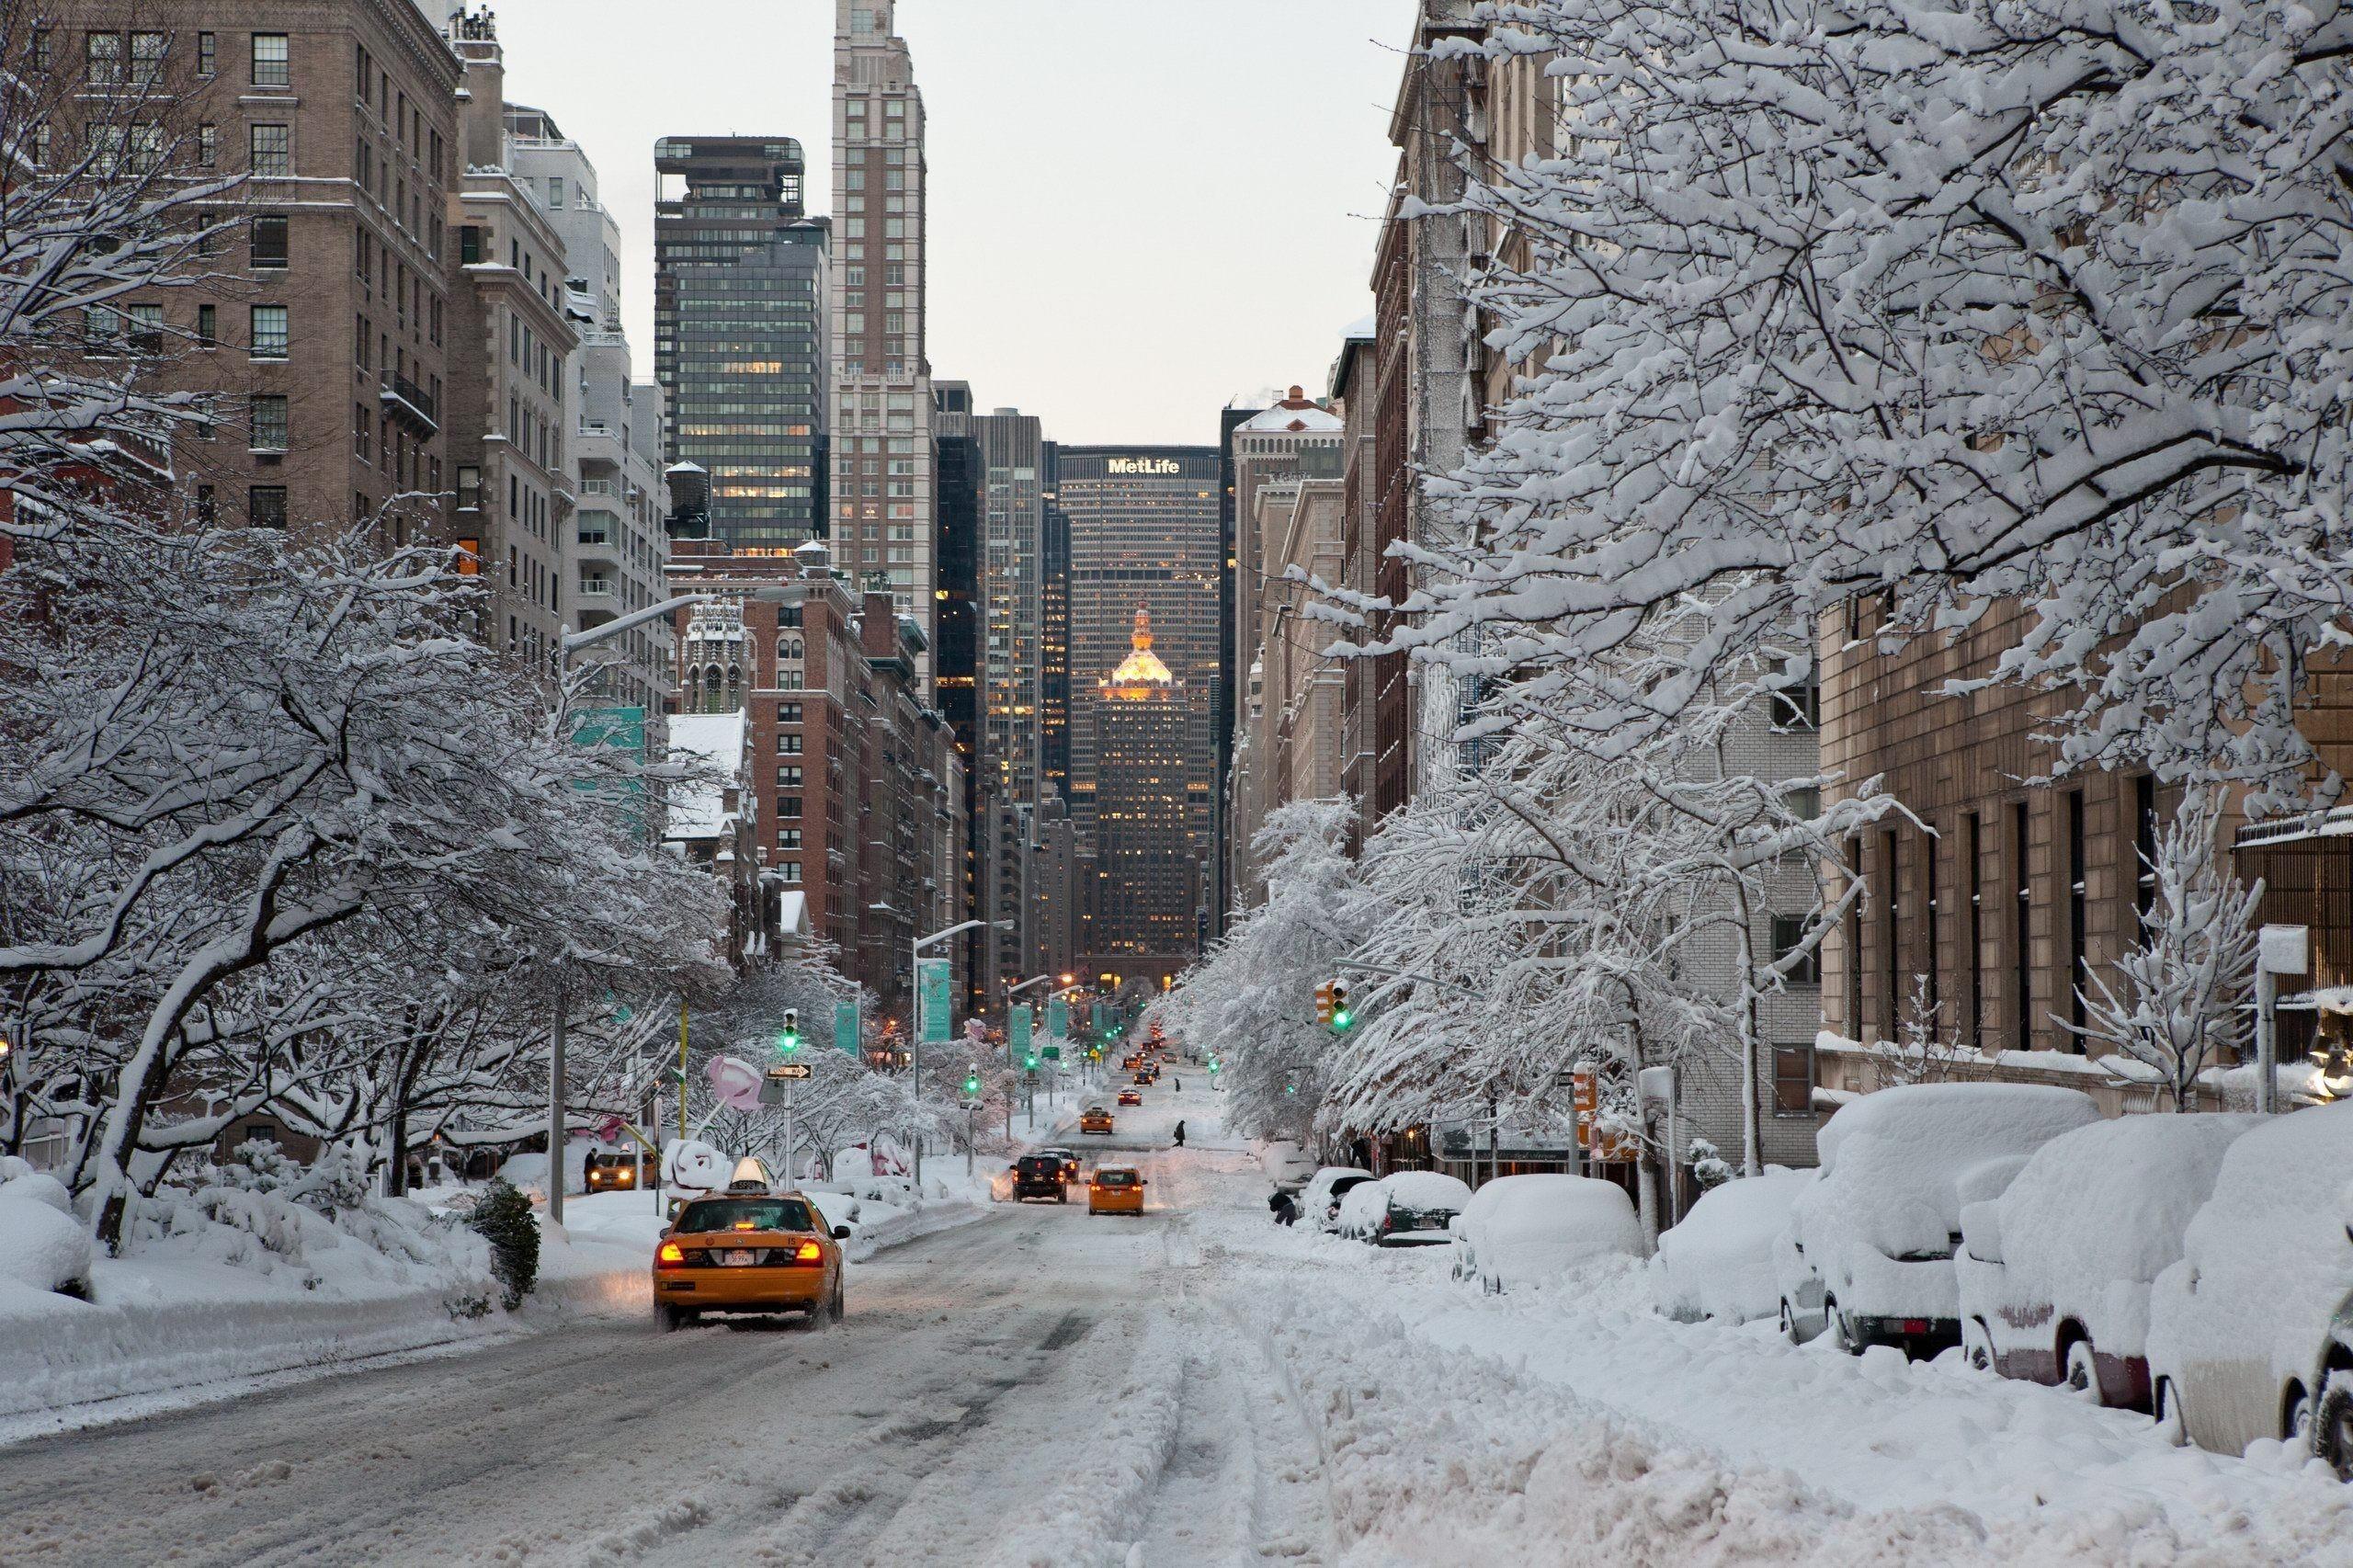 New York City Winter Wallpaper 62 images 2560x1706